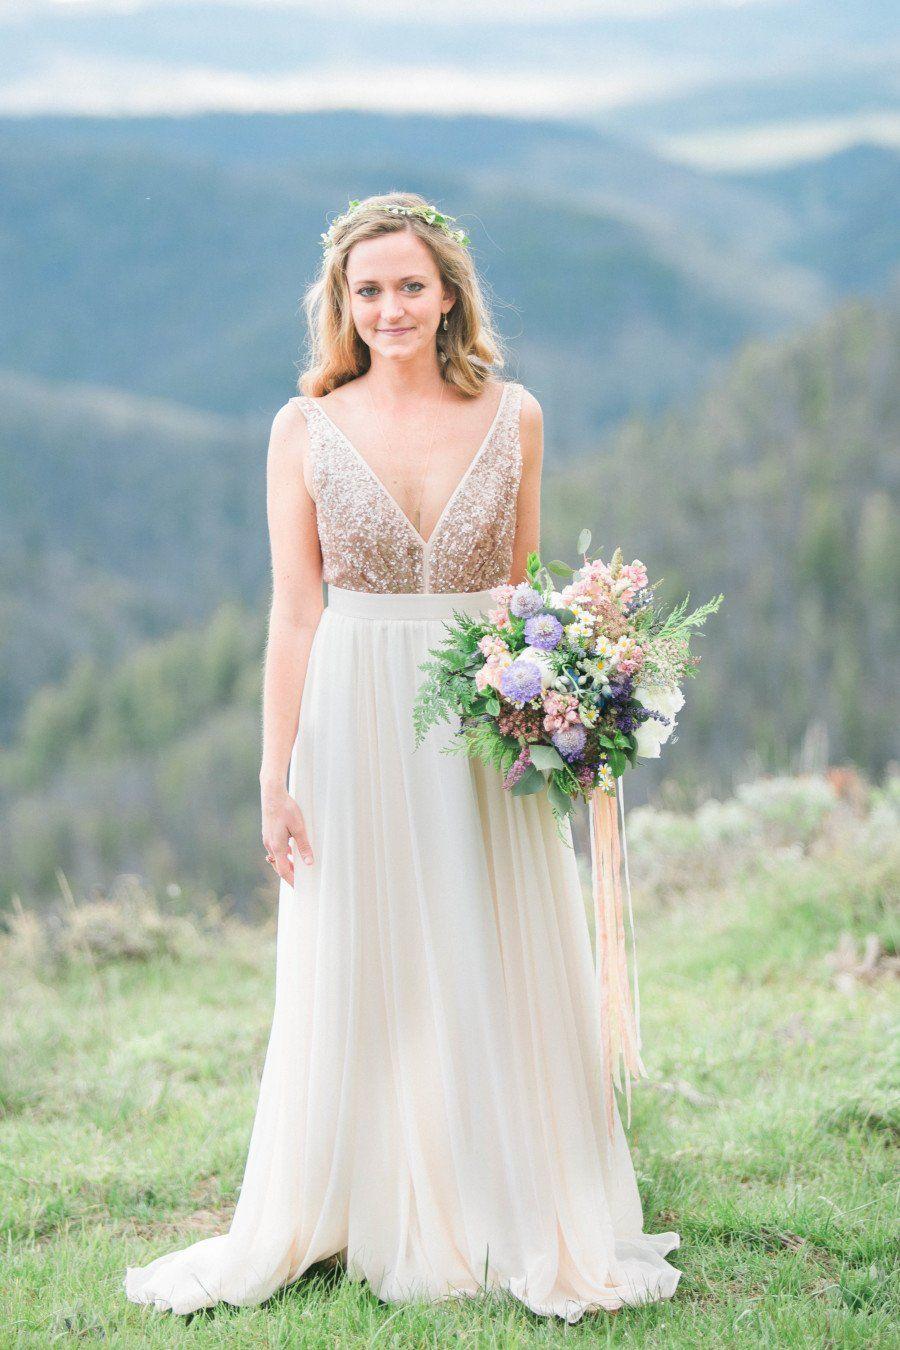 Rustic Backless Boho Wedding Dresses Deep V Neck Top Rose Gold Sequins And Chiffon Bohemian Wedding Dress 2019 Cheap Weeding Dress For Women